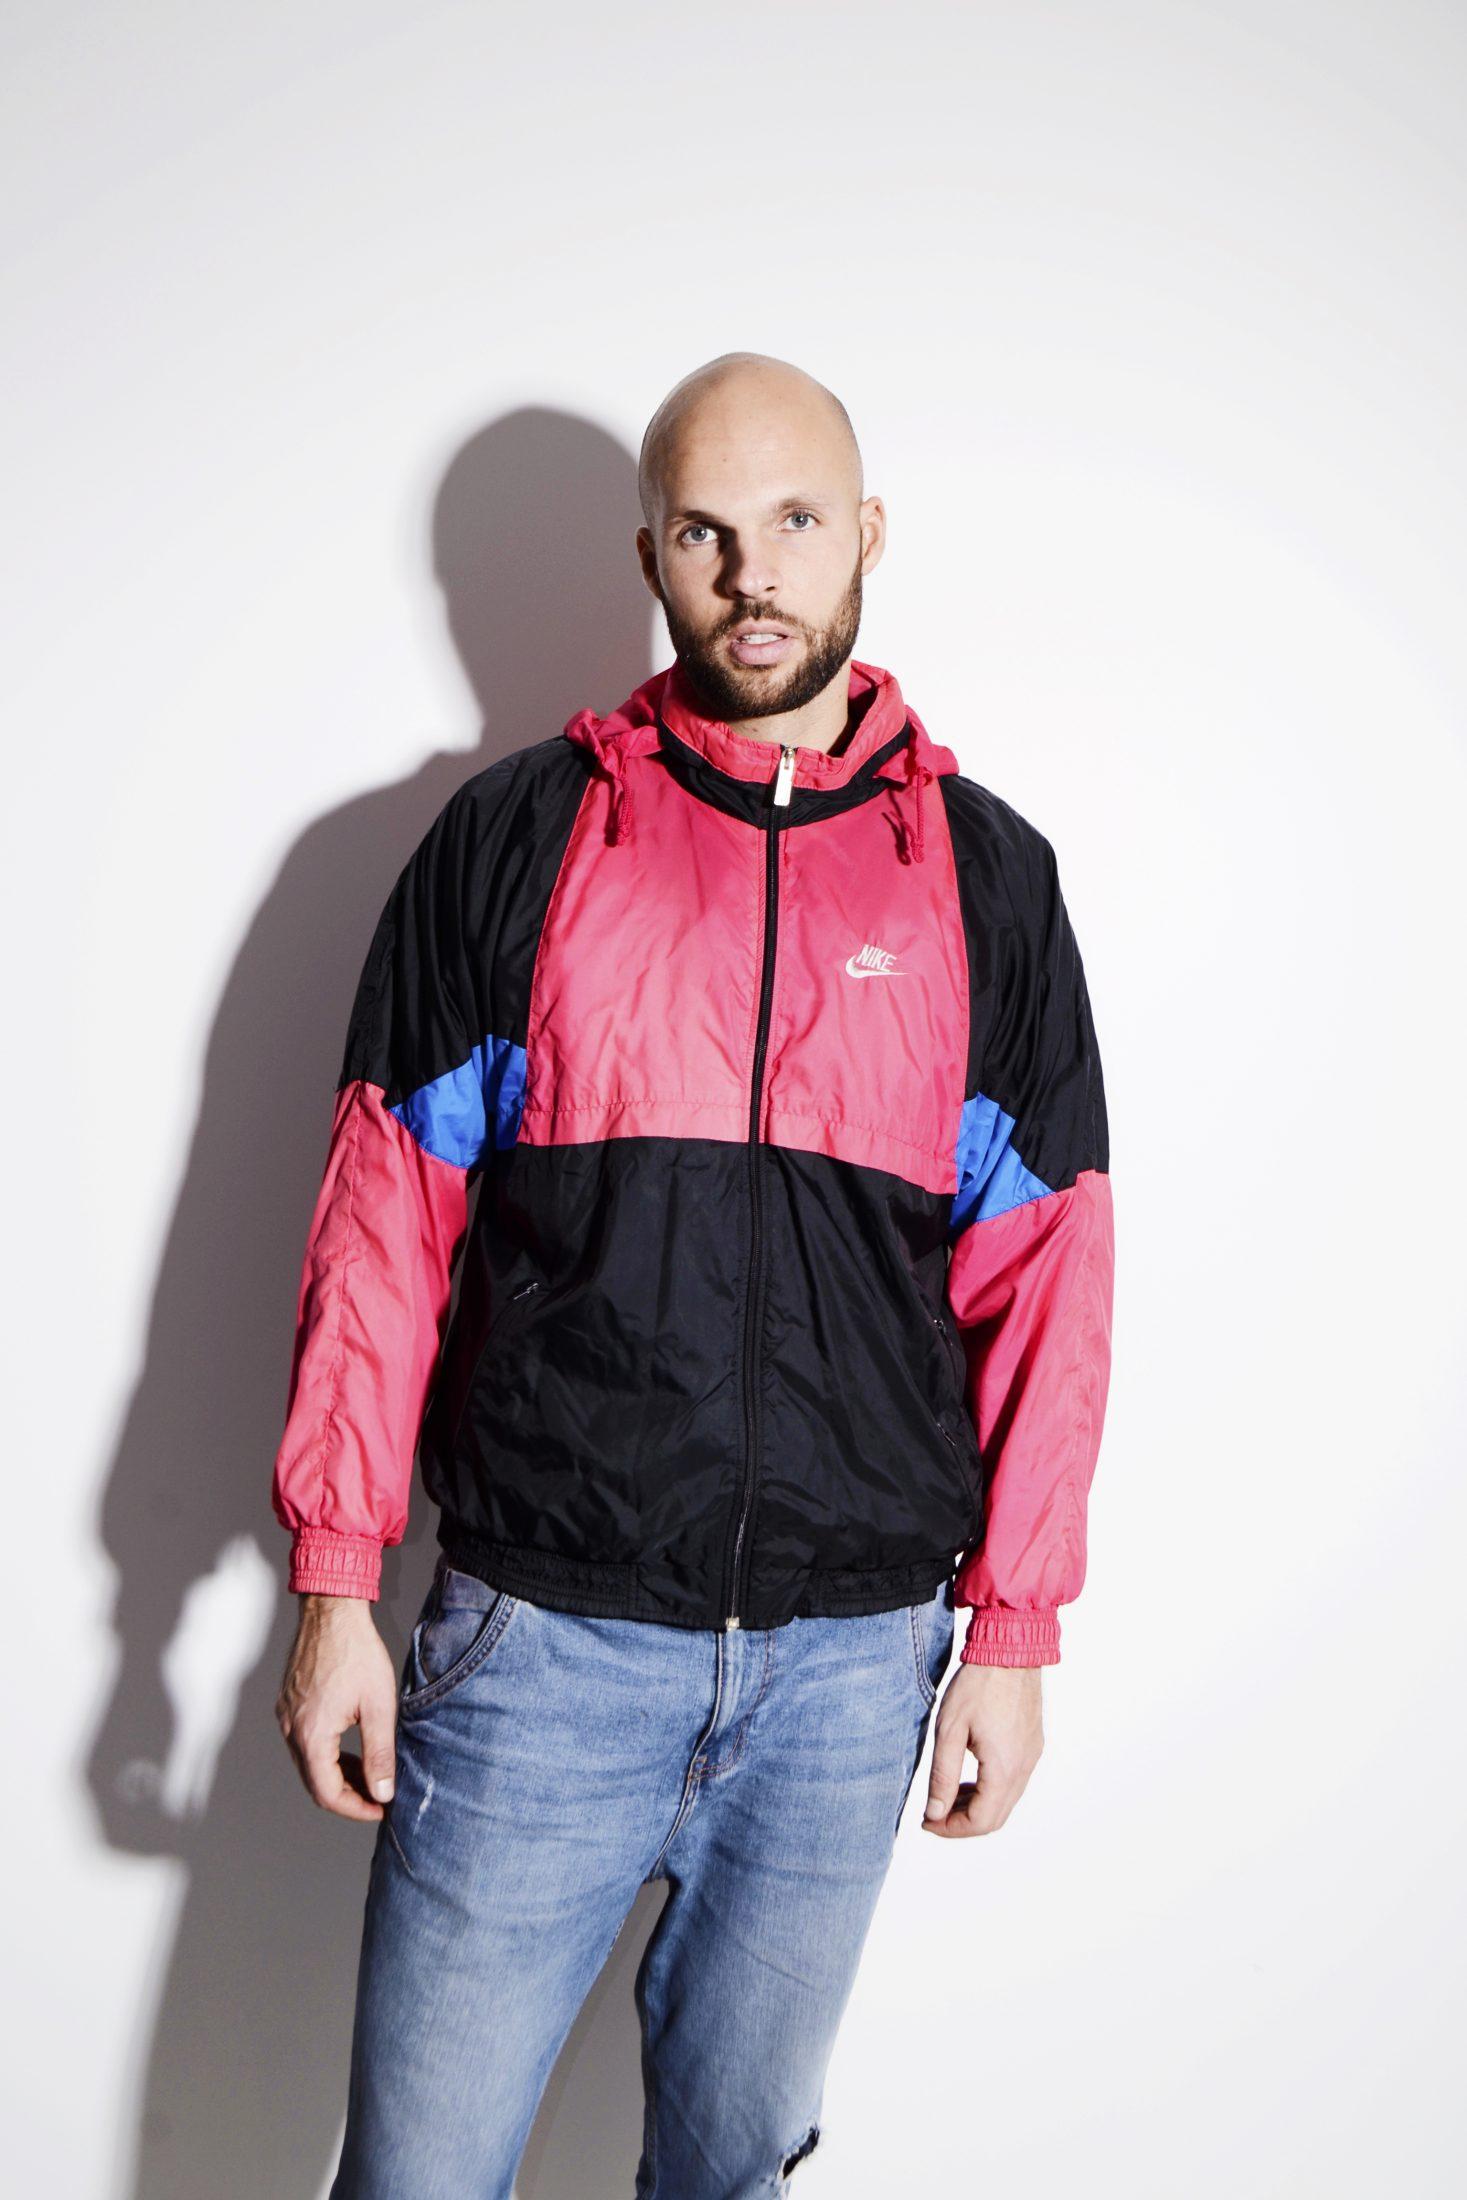 d56ea36bf NIKE vintage pink shell jacket